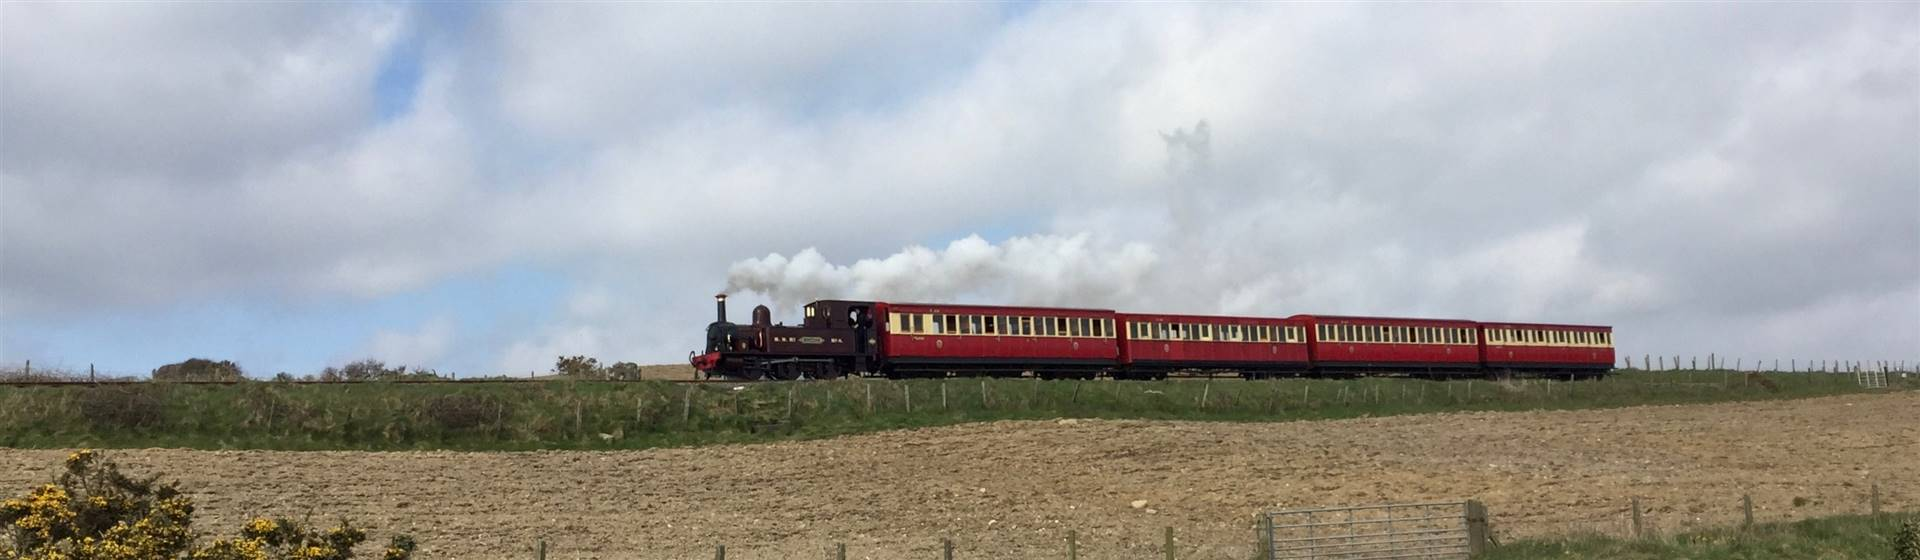 "<img src=""isleofmansteamrailway-adobestock_260236098.jpeg"" alt=""Isle of Man Railway""/>"